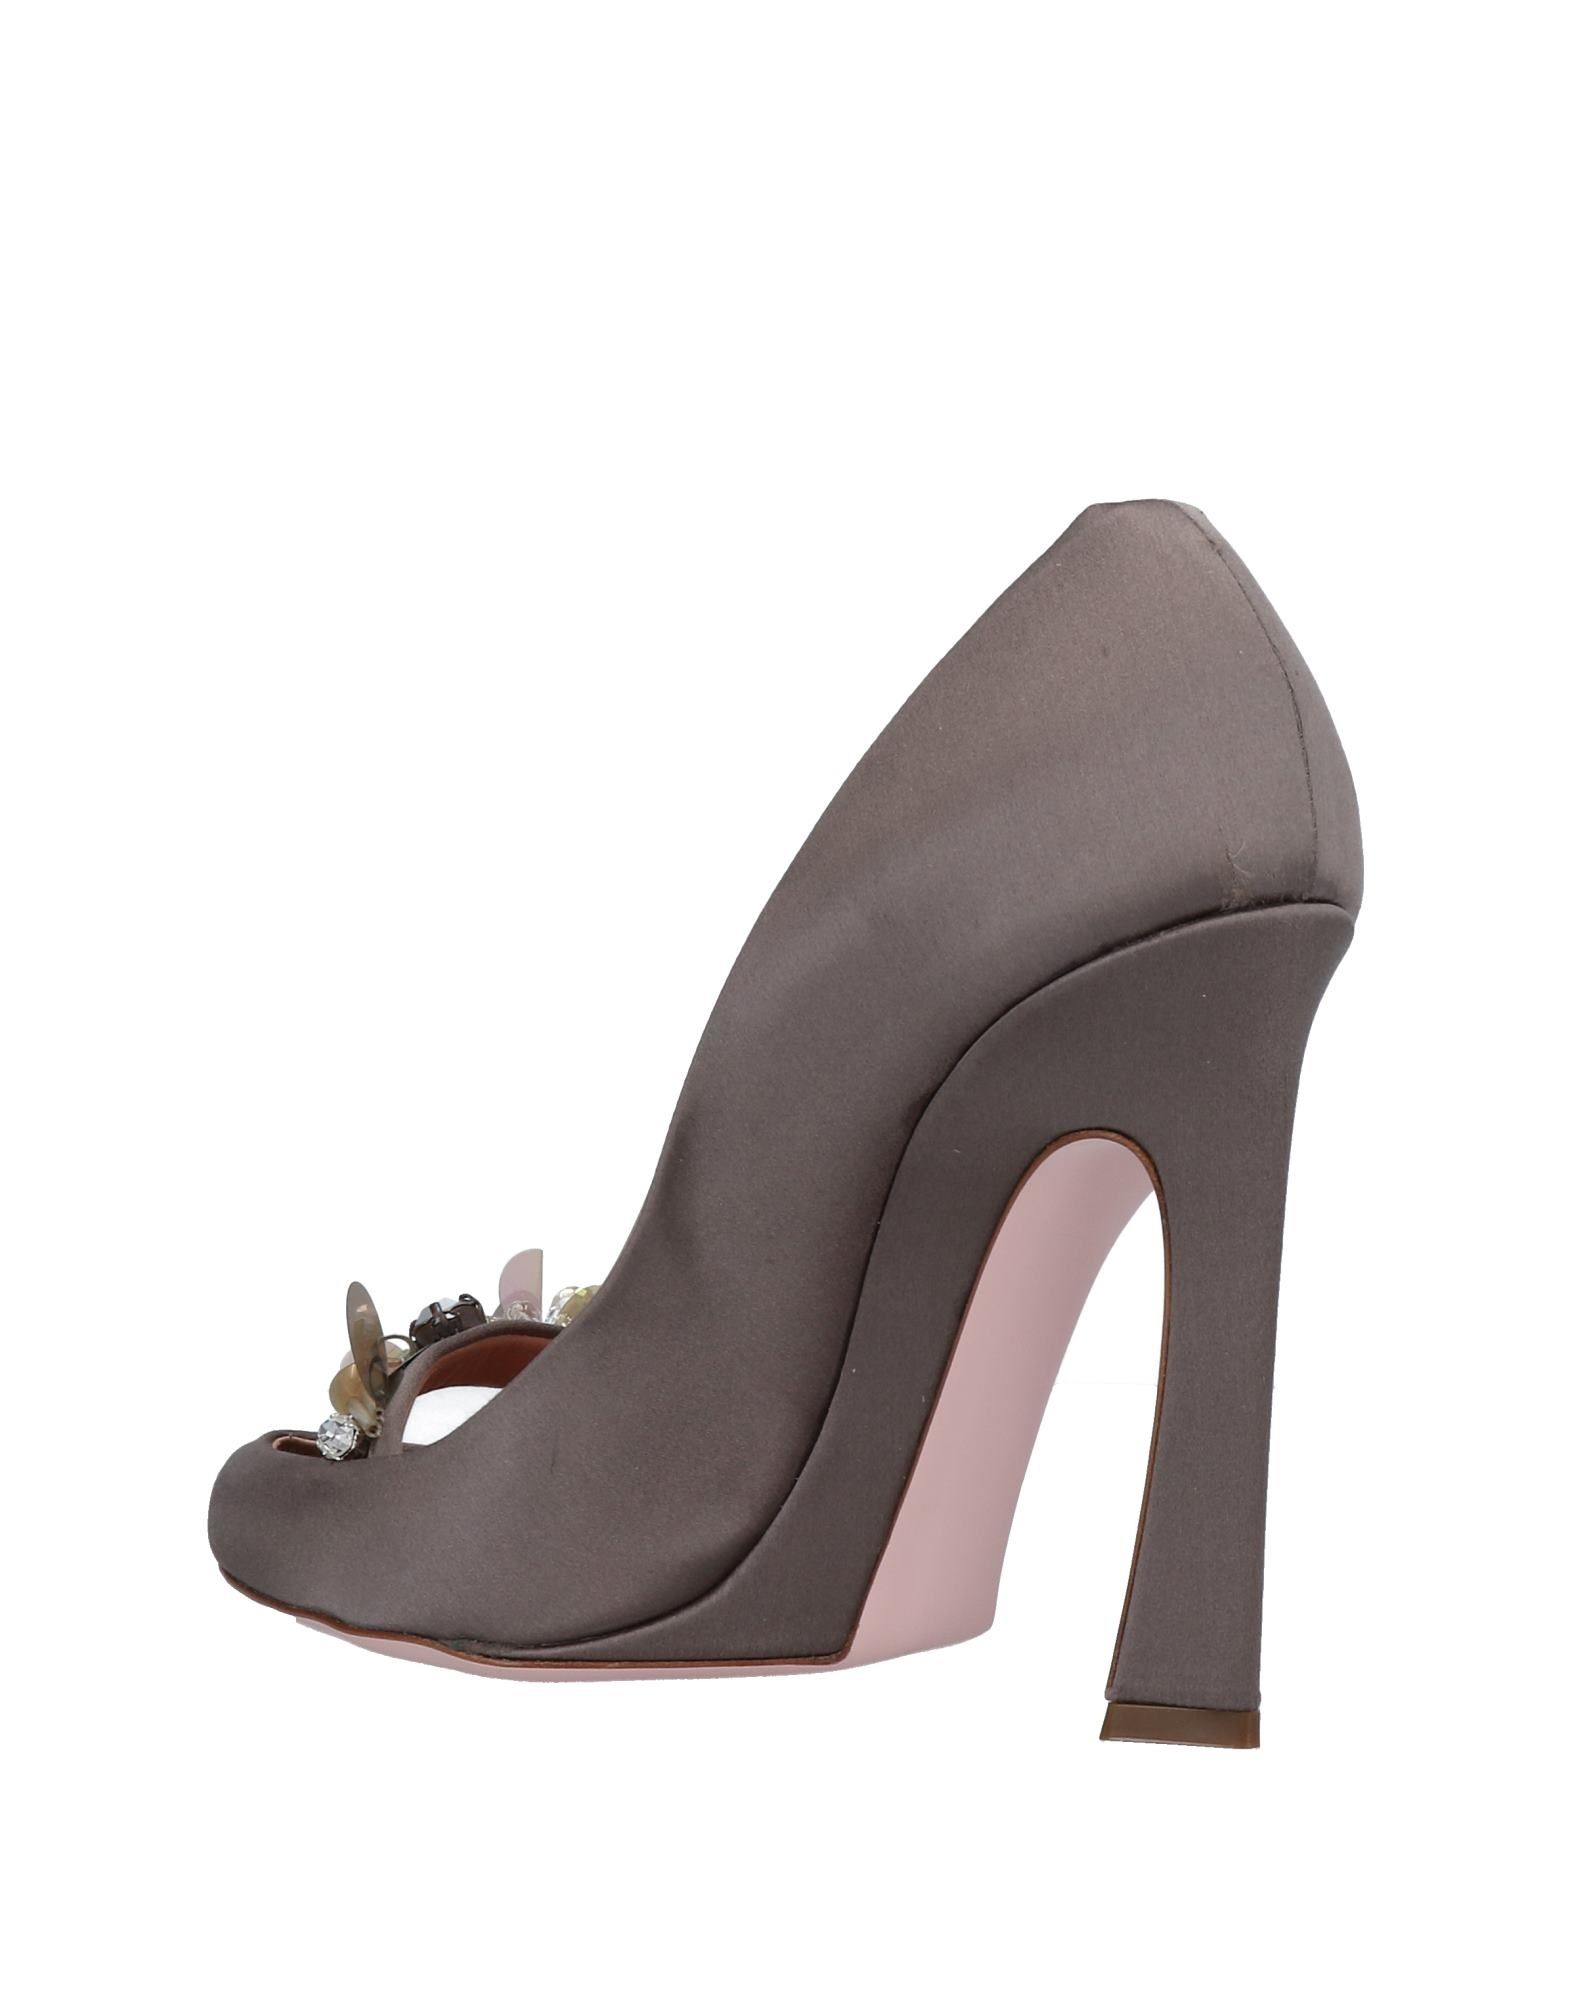 Nina Ricci gut Pumps Damen  11488975FHGünstige gut Ricci aussehende Schuhe a2eaf0